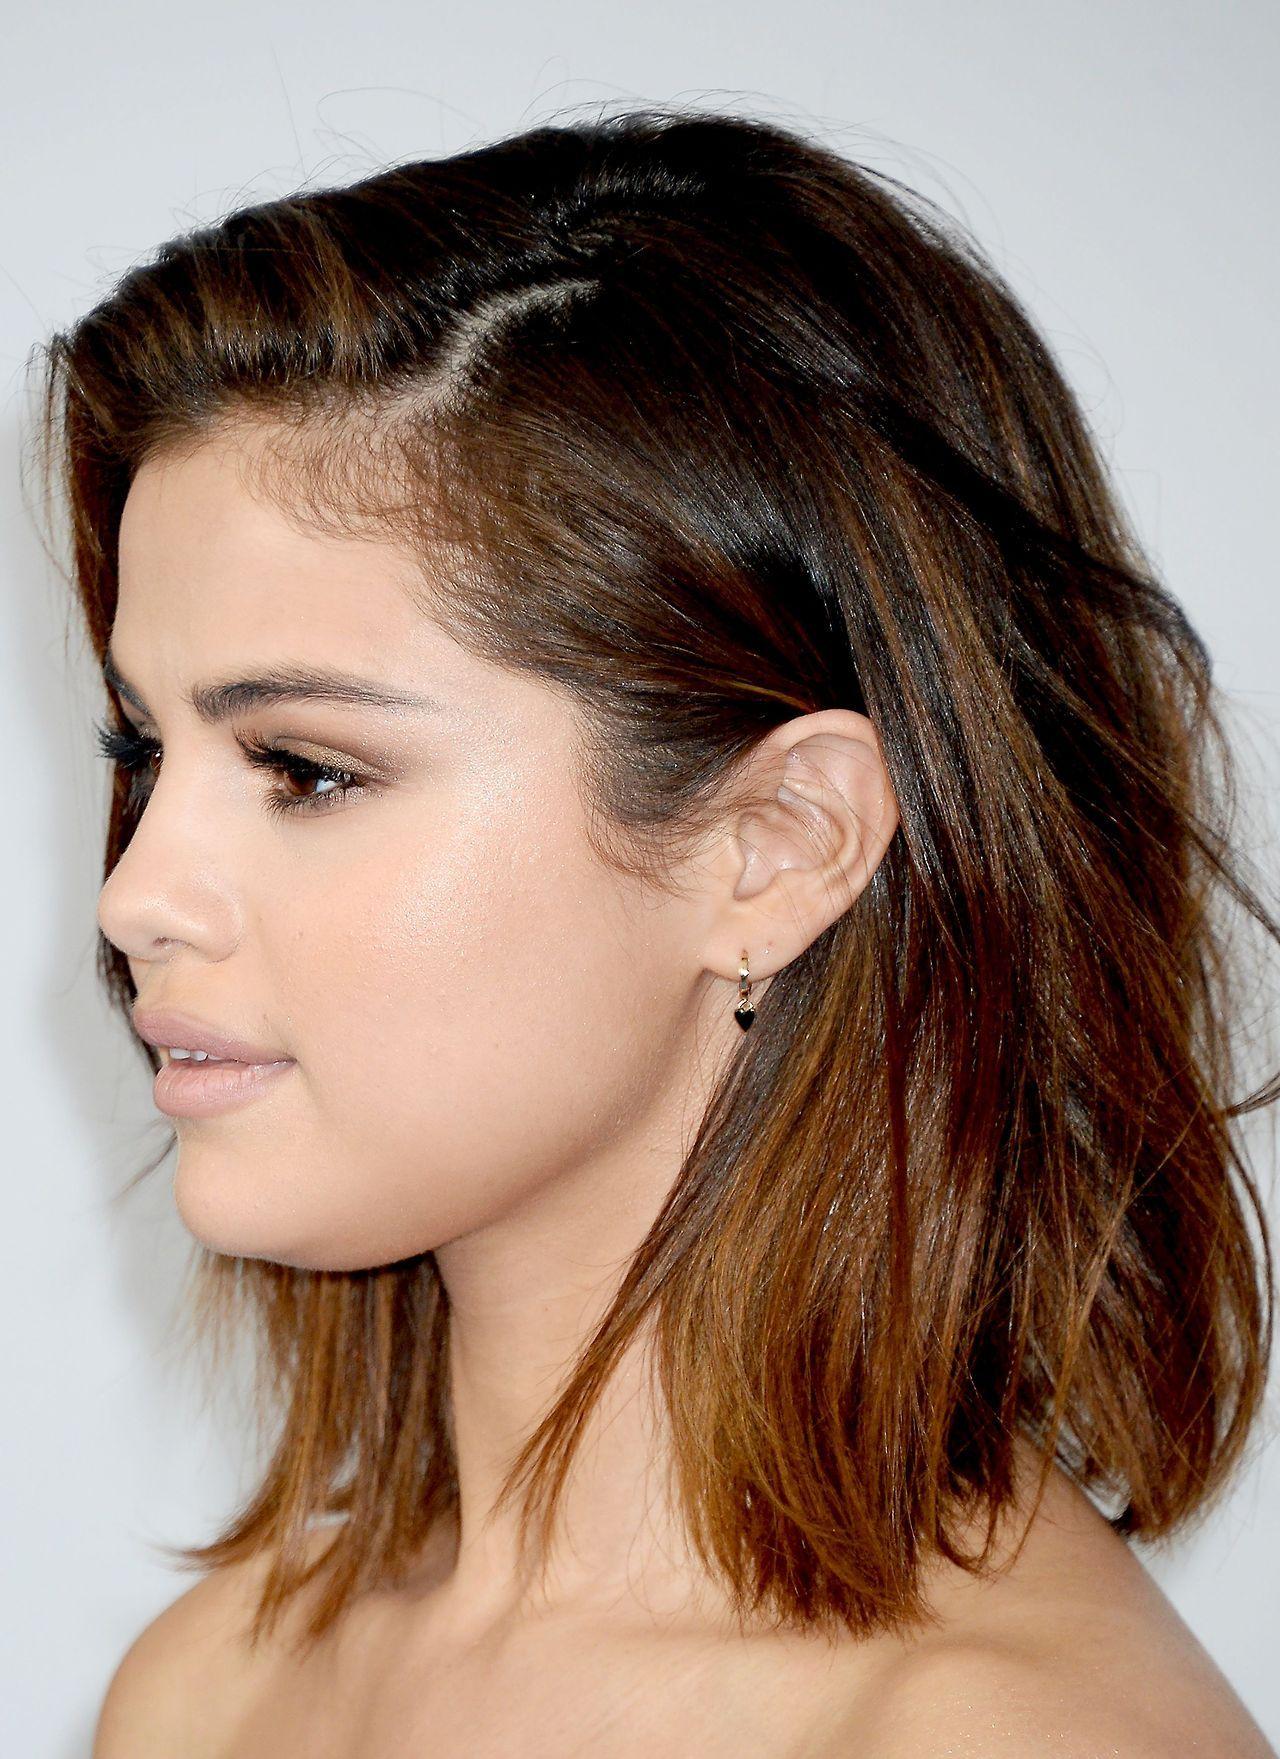 Selena Gomez News Selena Gomez Pinterest